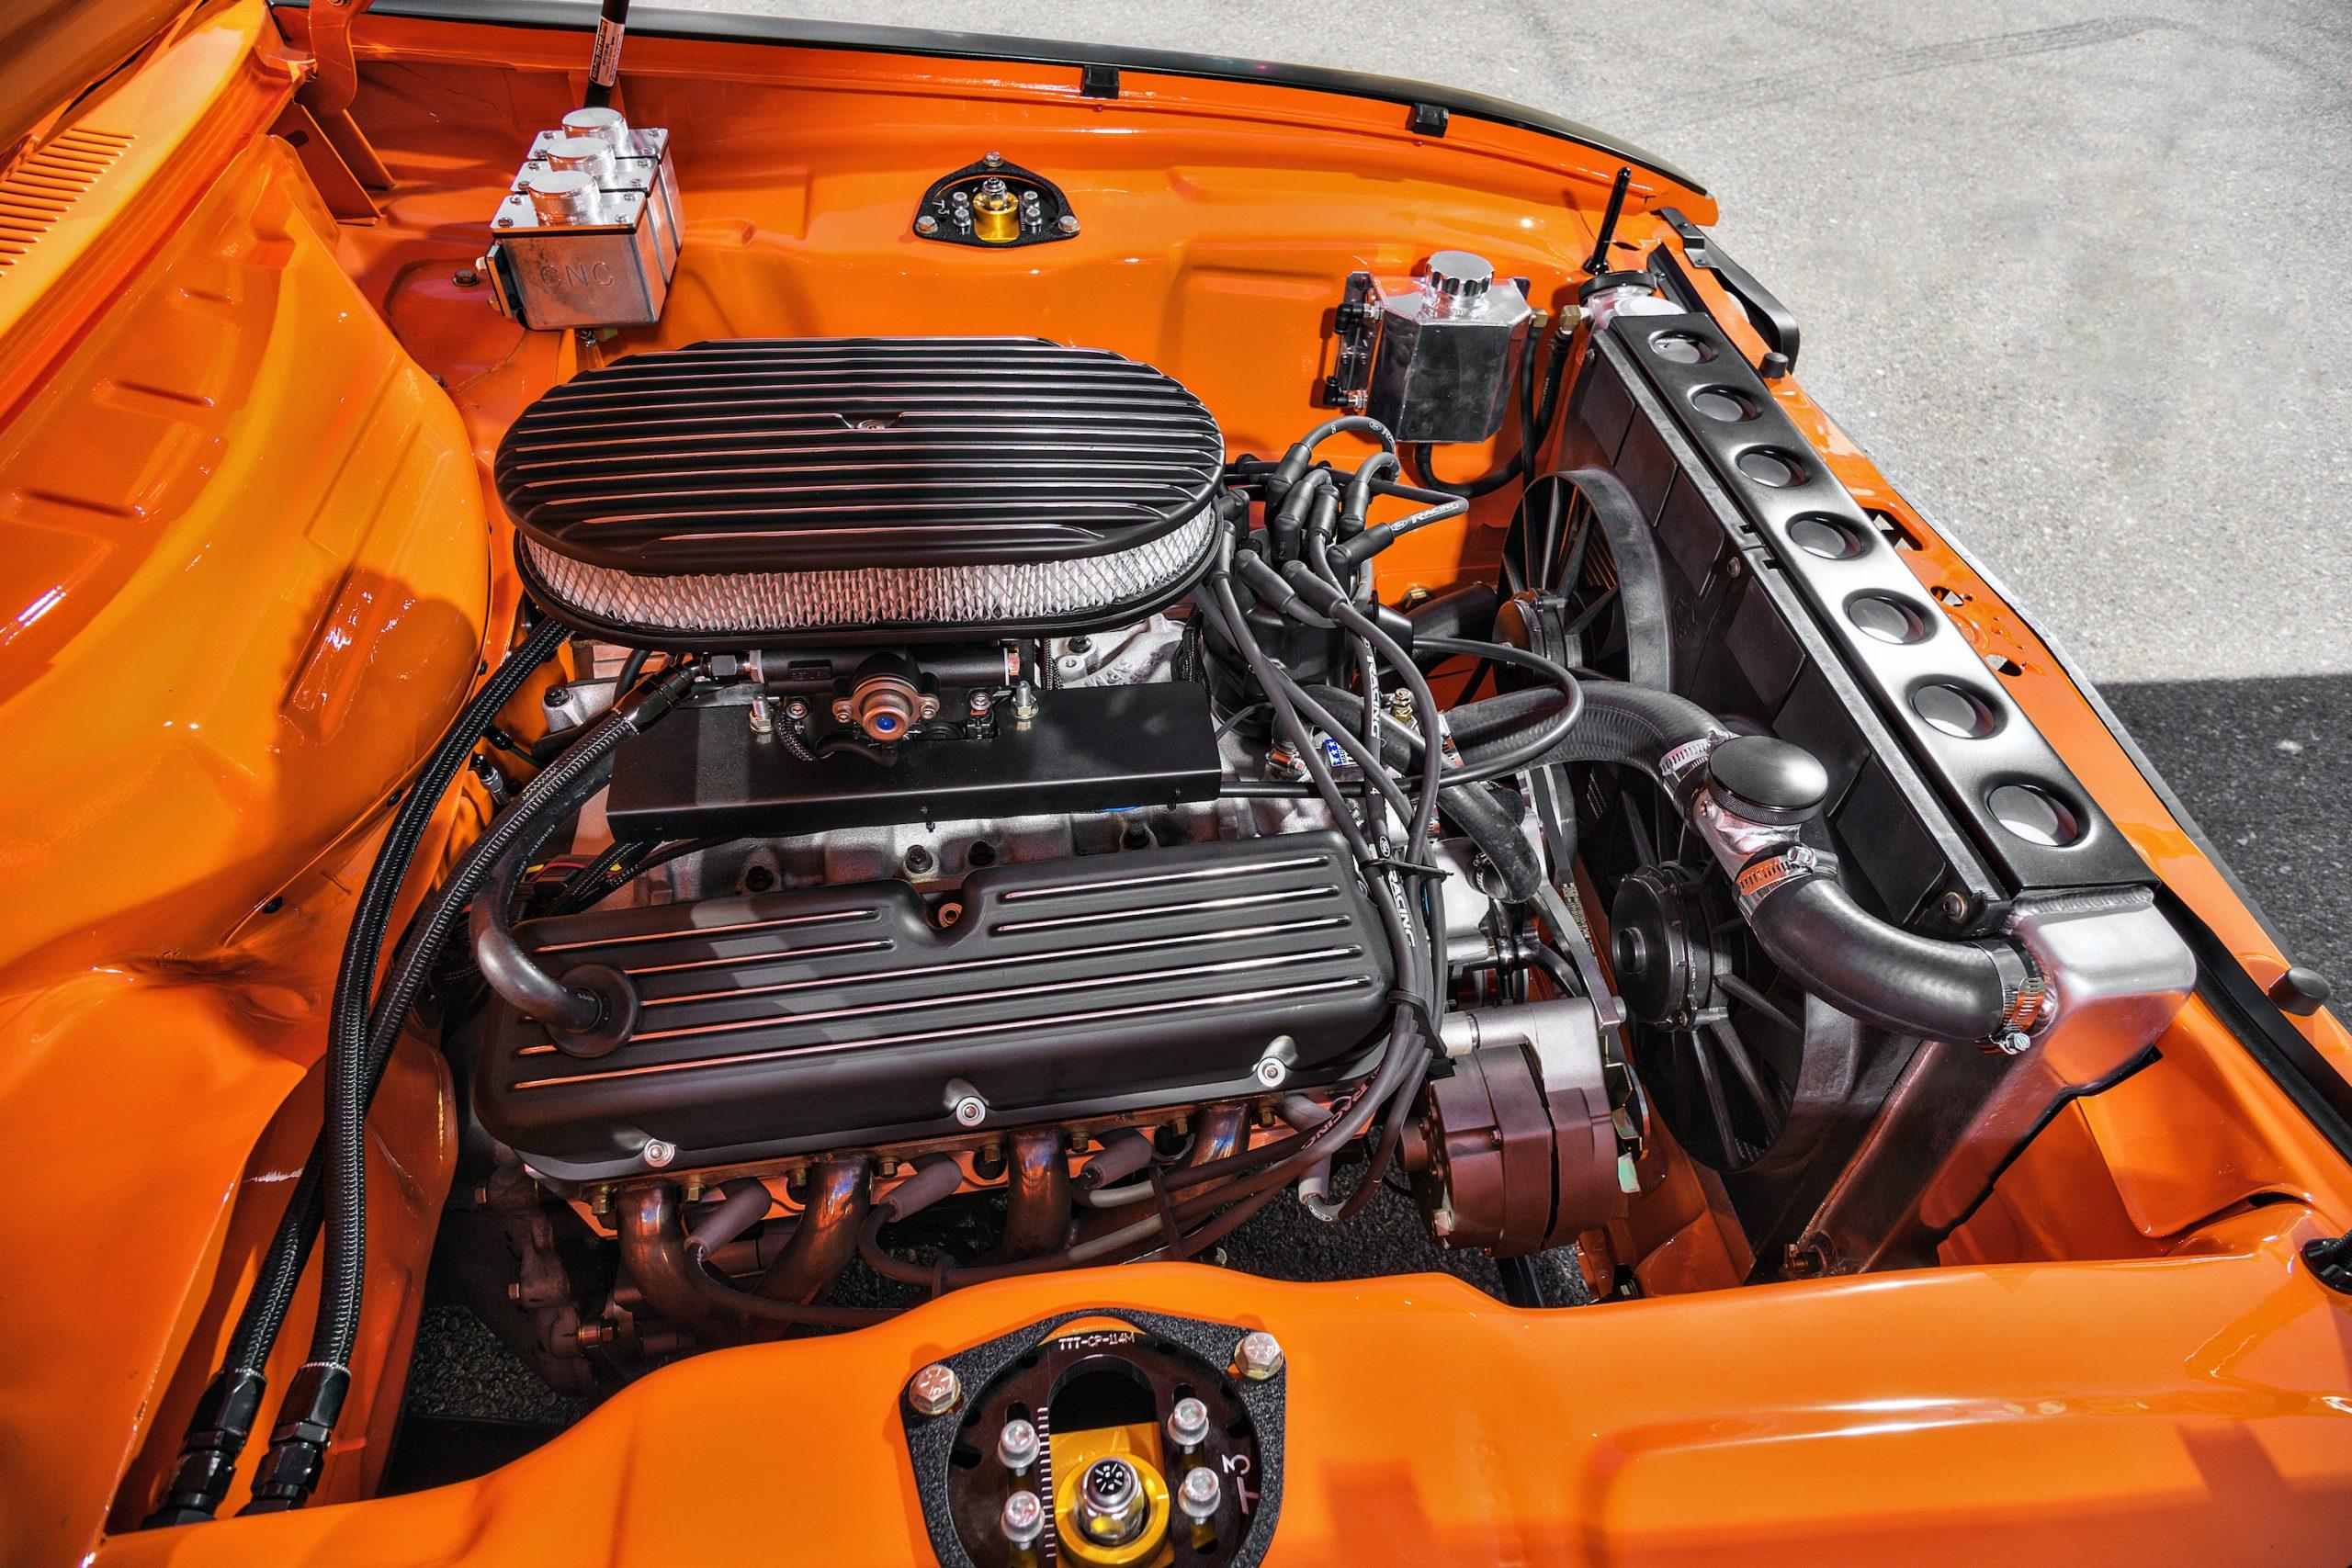 1974 Mk I Ford Capri restomod engine left